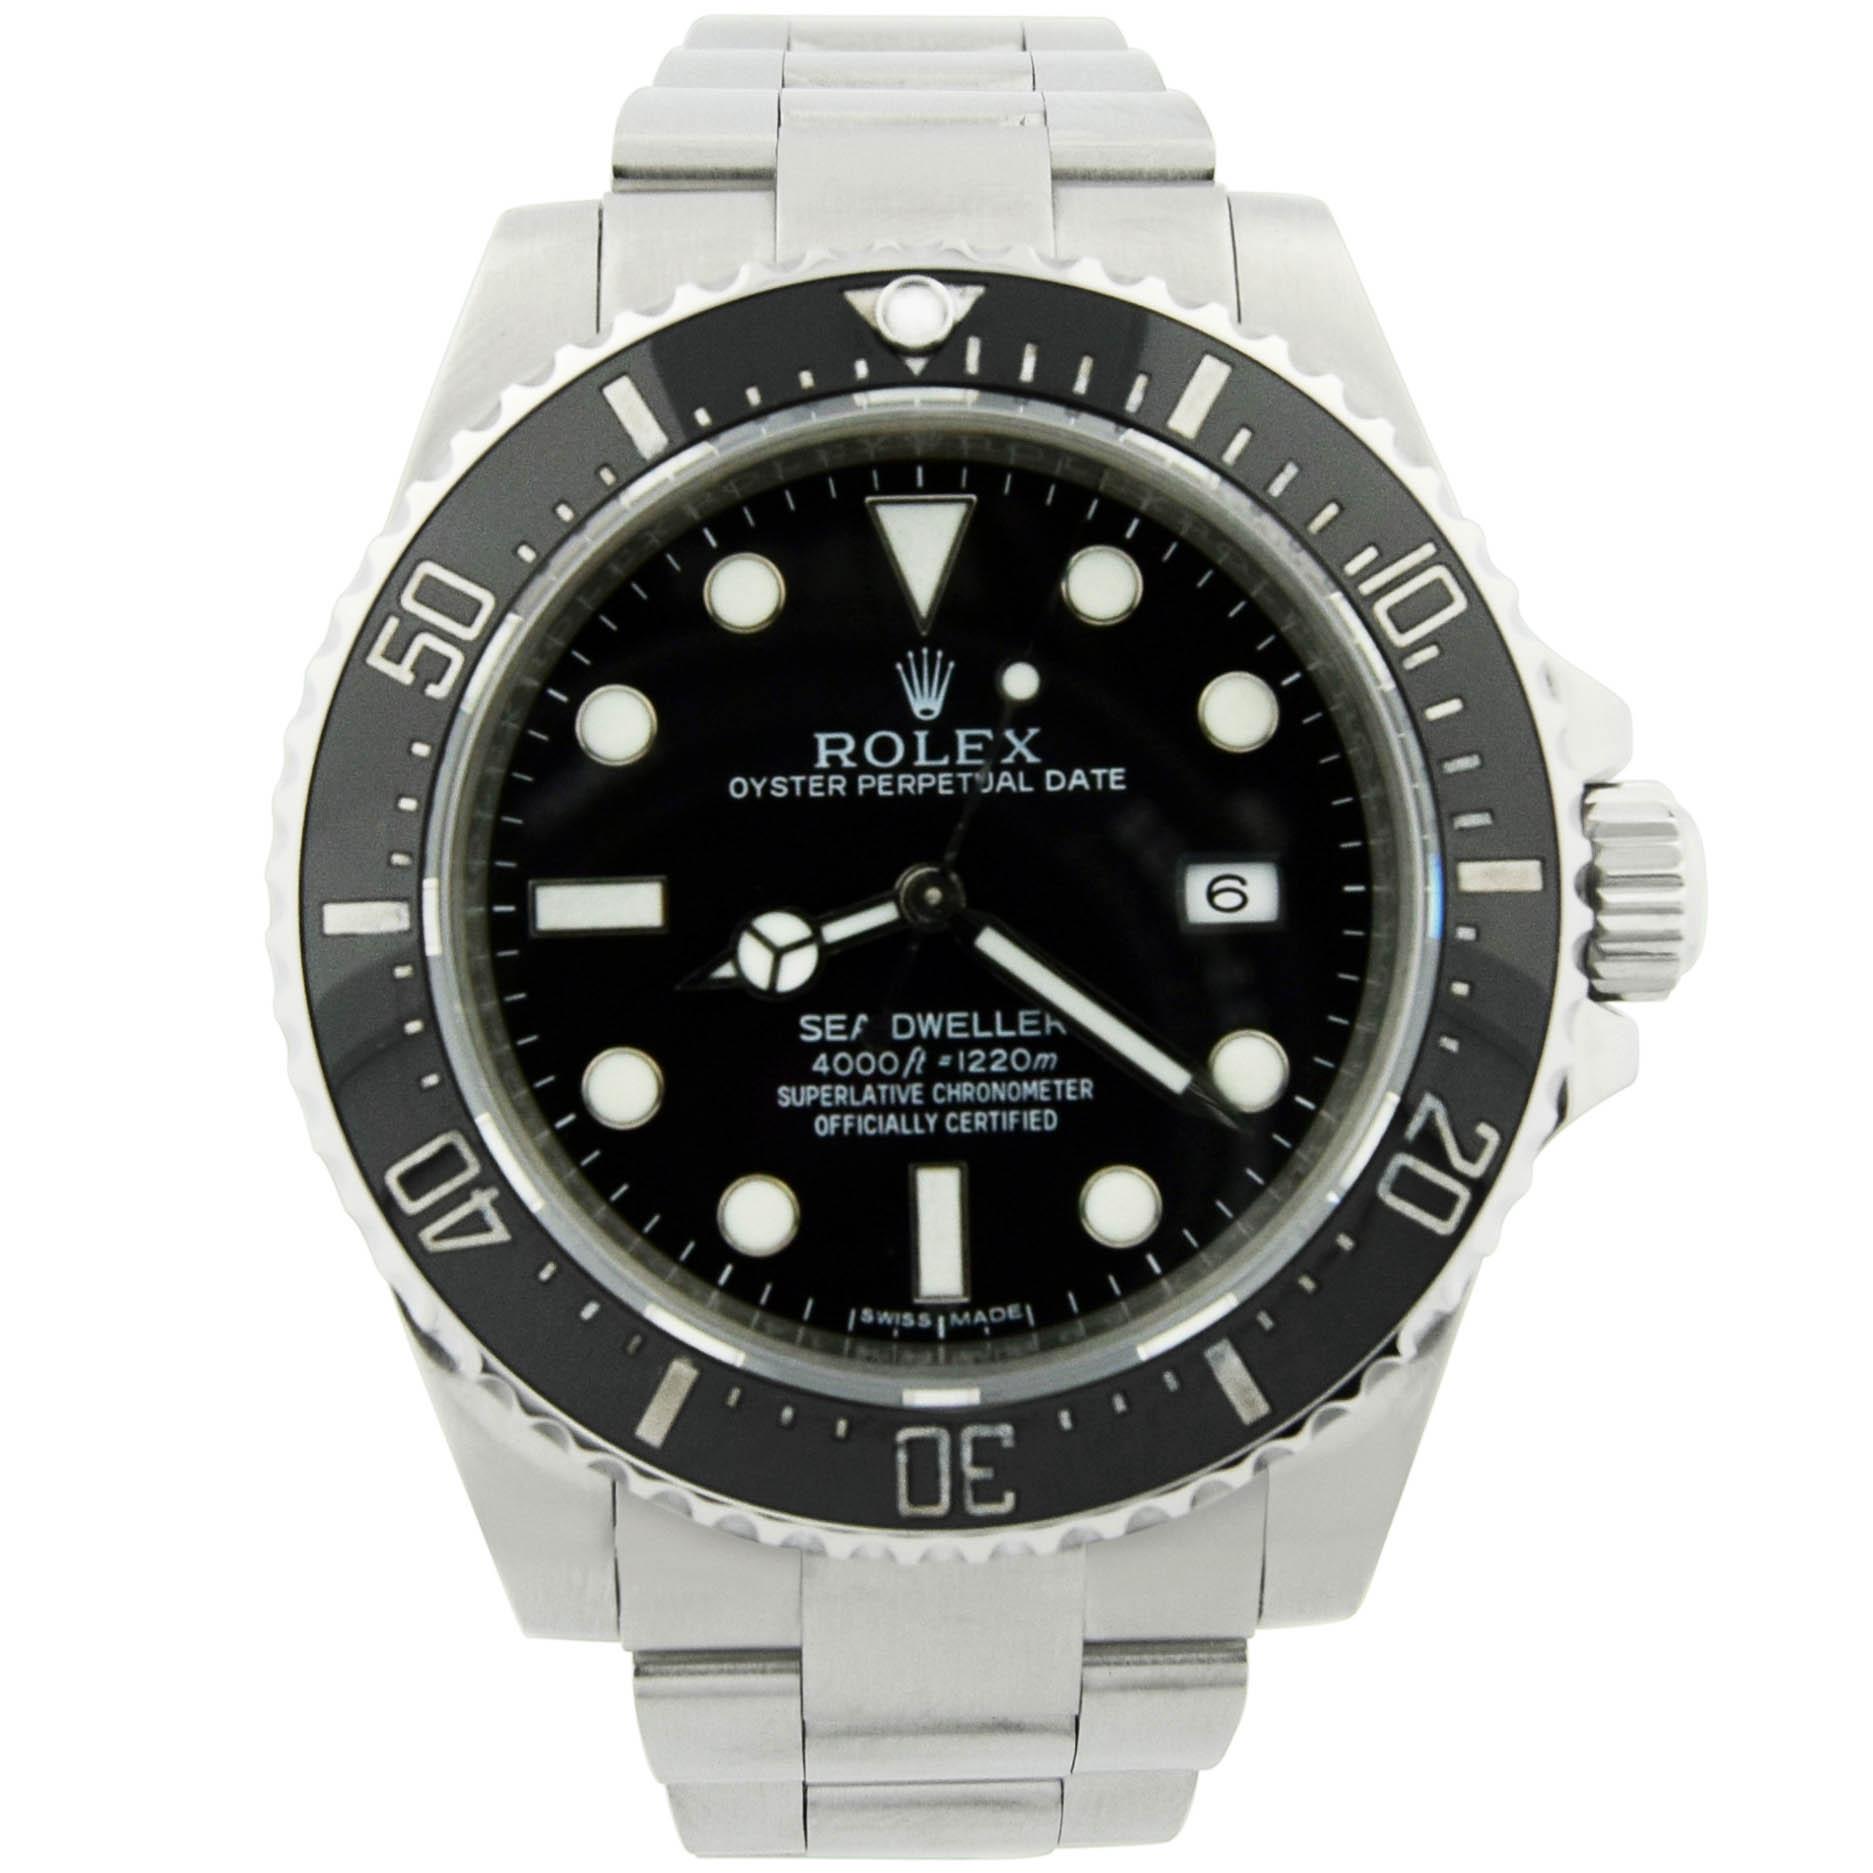 bedc85709b0 Rolex Sea-Dweller Mens 40mm Black Dial Steel Ceramic Bezel 116600 ...